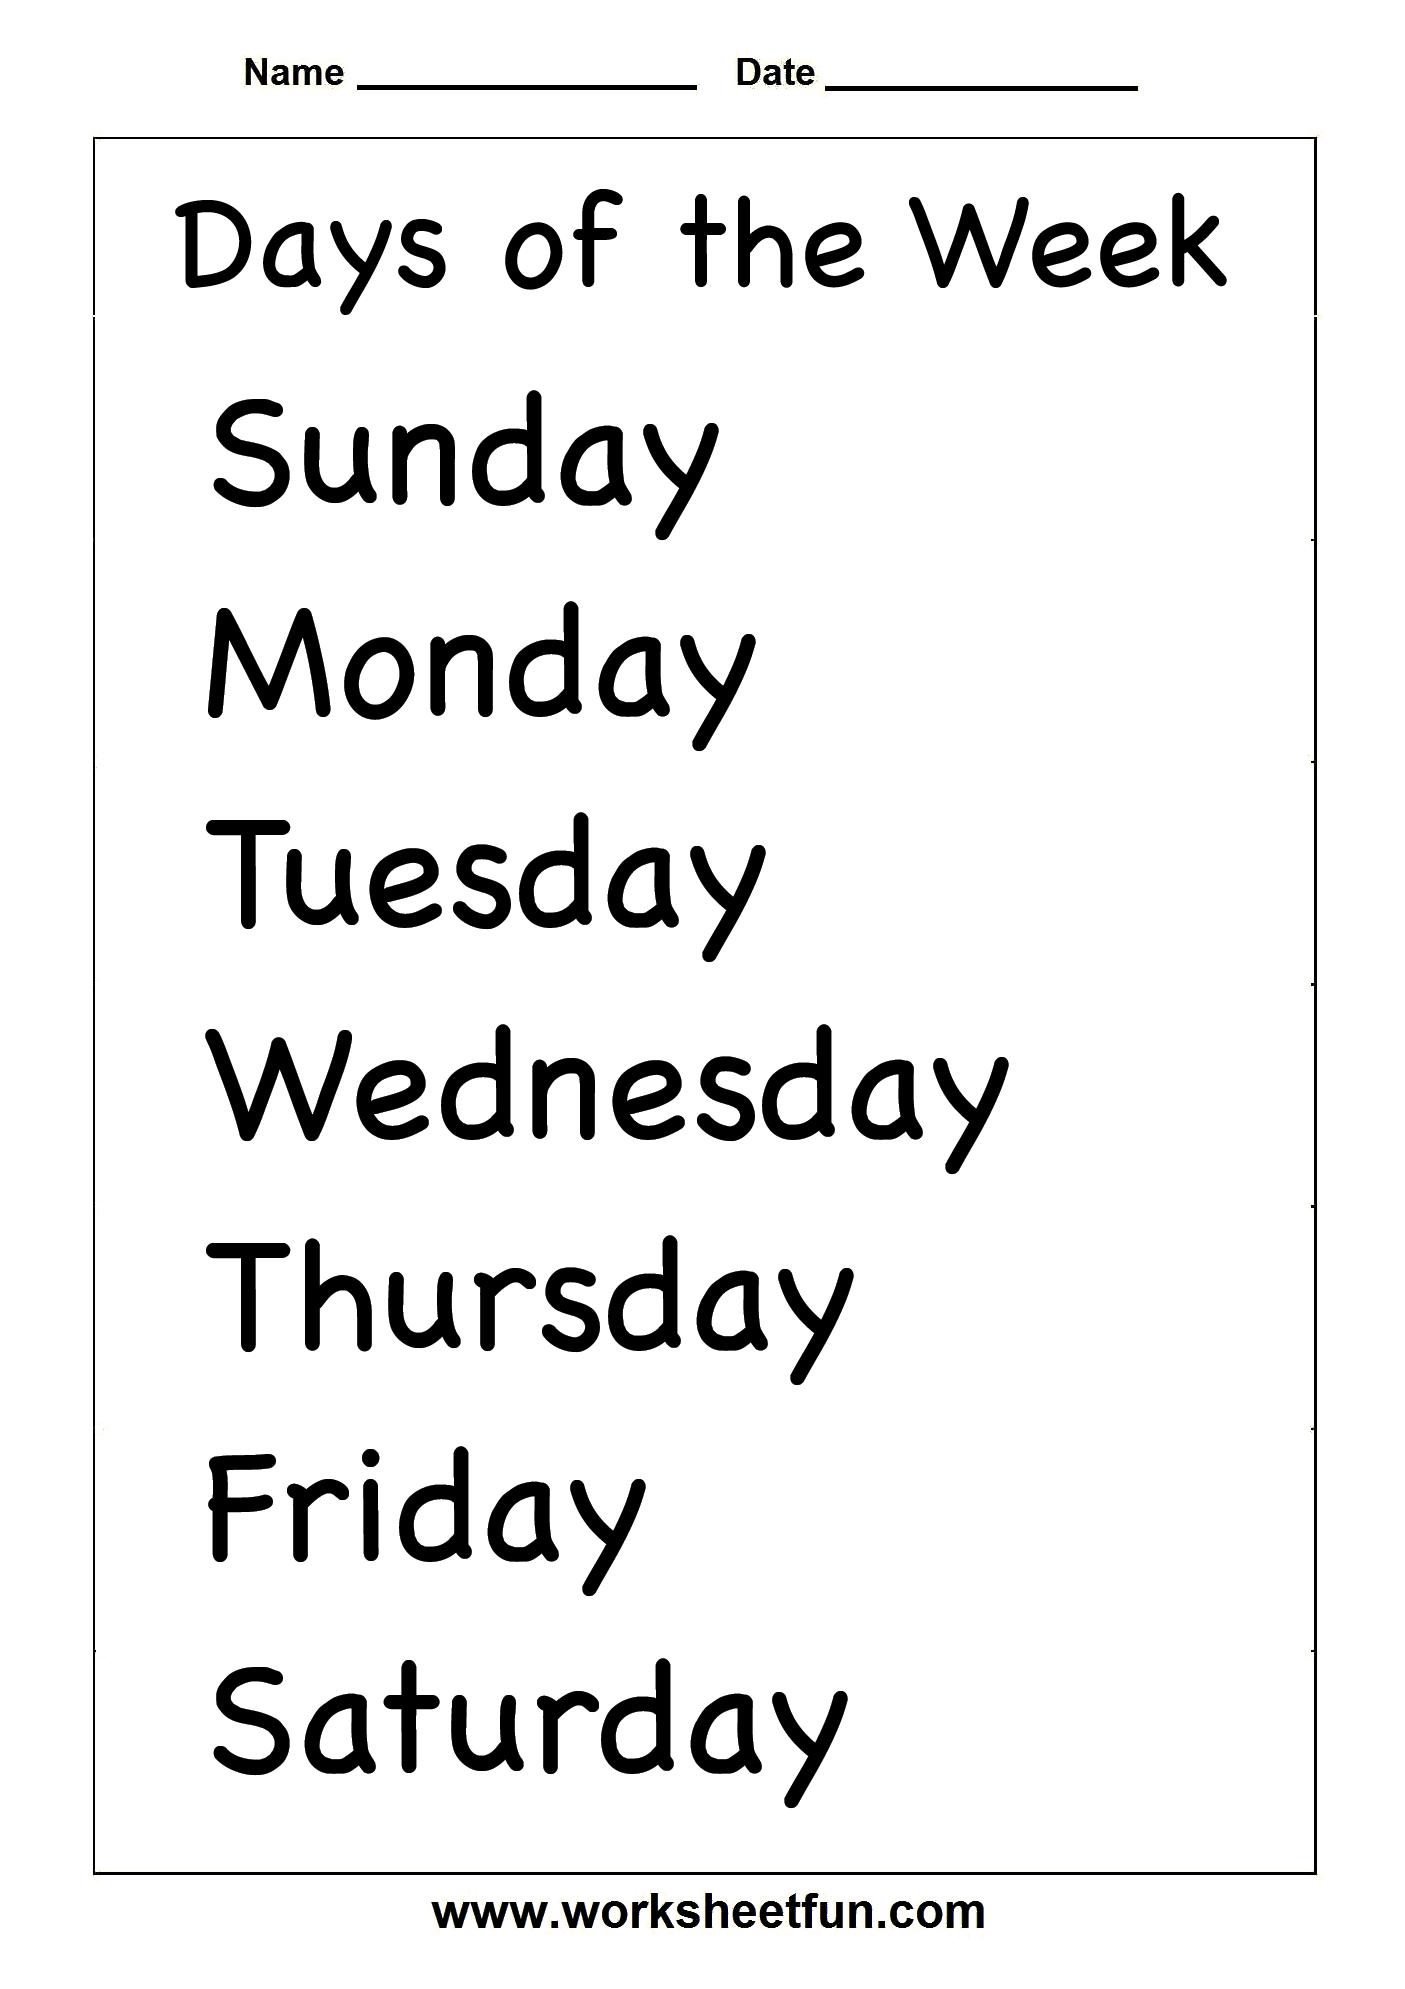 days of the week | Free printable worksheets, Weather ...